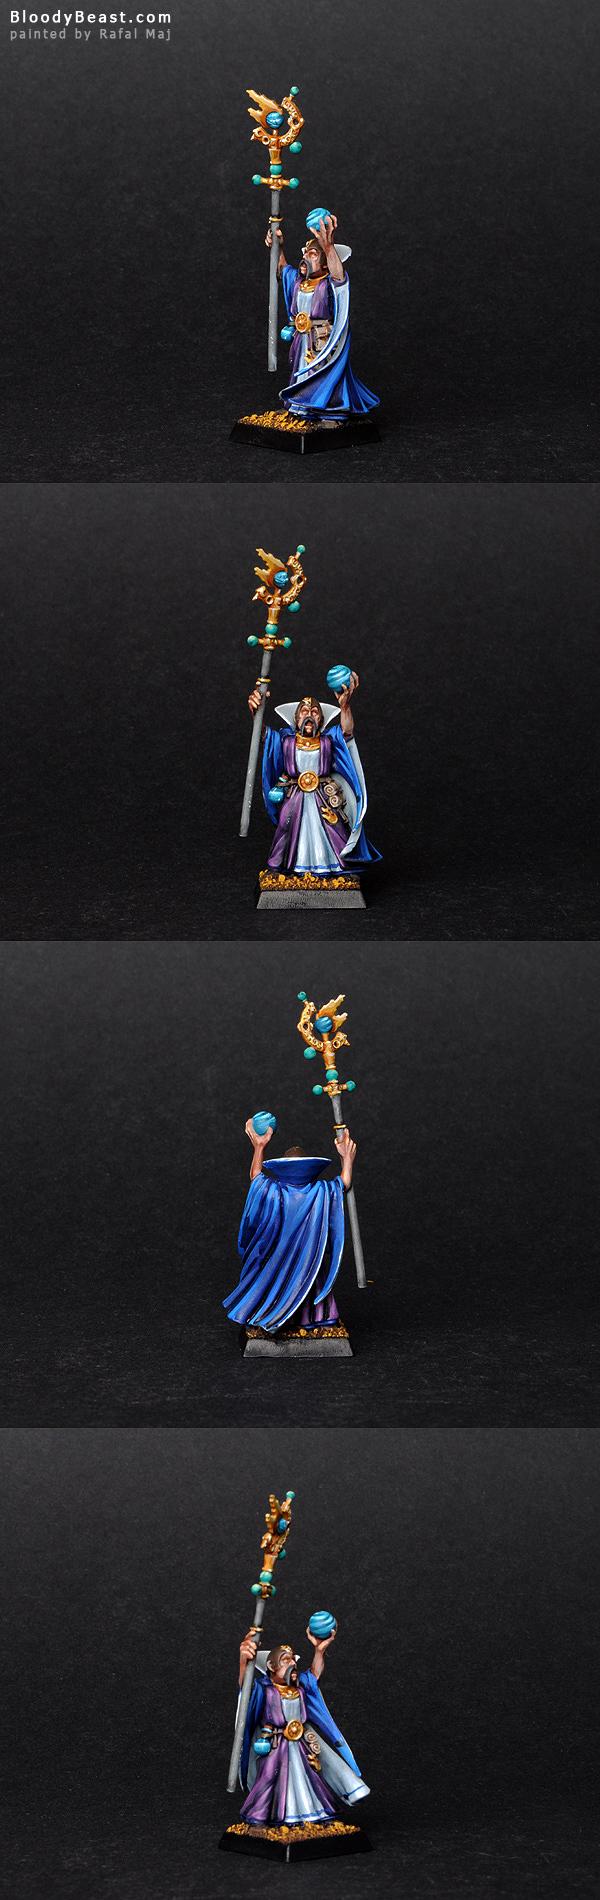 Empire Celestial Wizard painted by Rafal Maj (BloodyBeast.com)